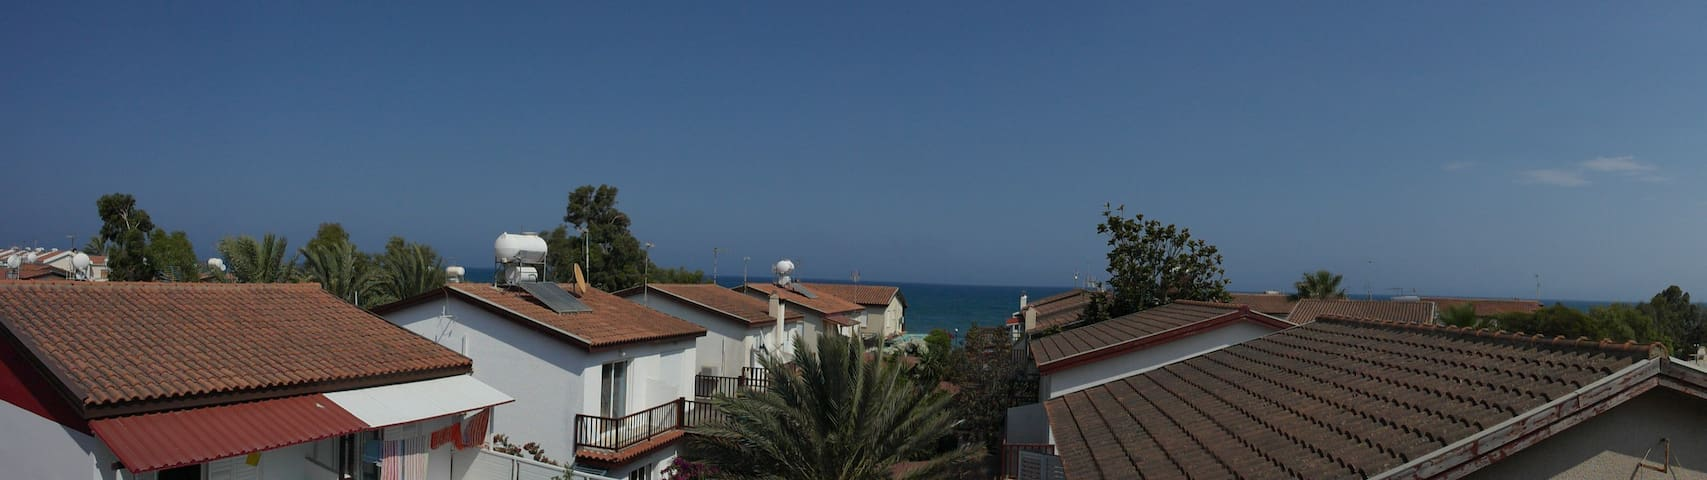 Супер апартаменты 70кв м, 3 комнаты, в 50м от моря - Meneou - Appartamento